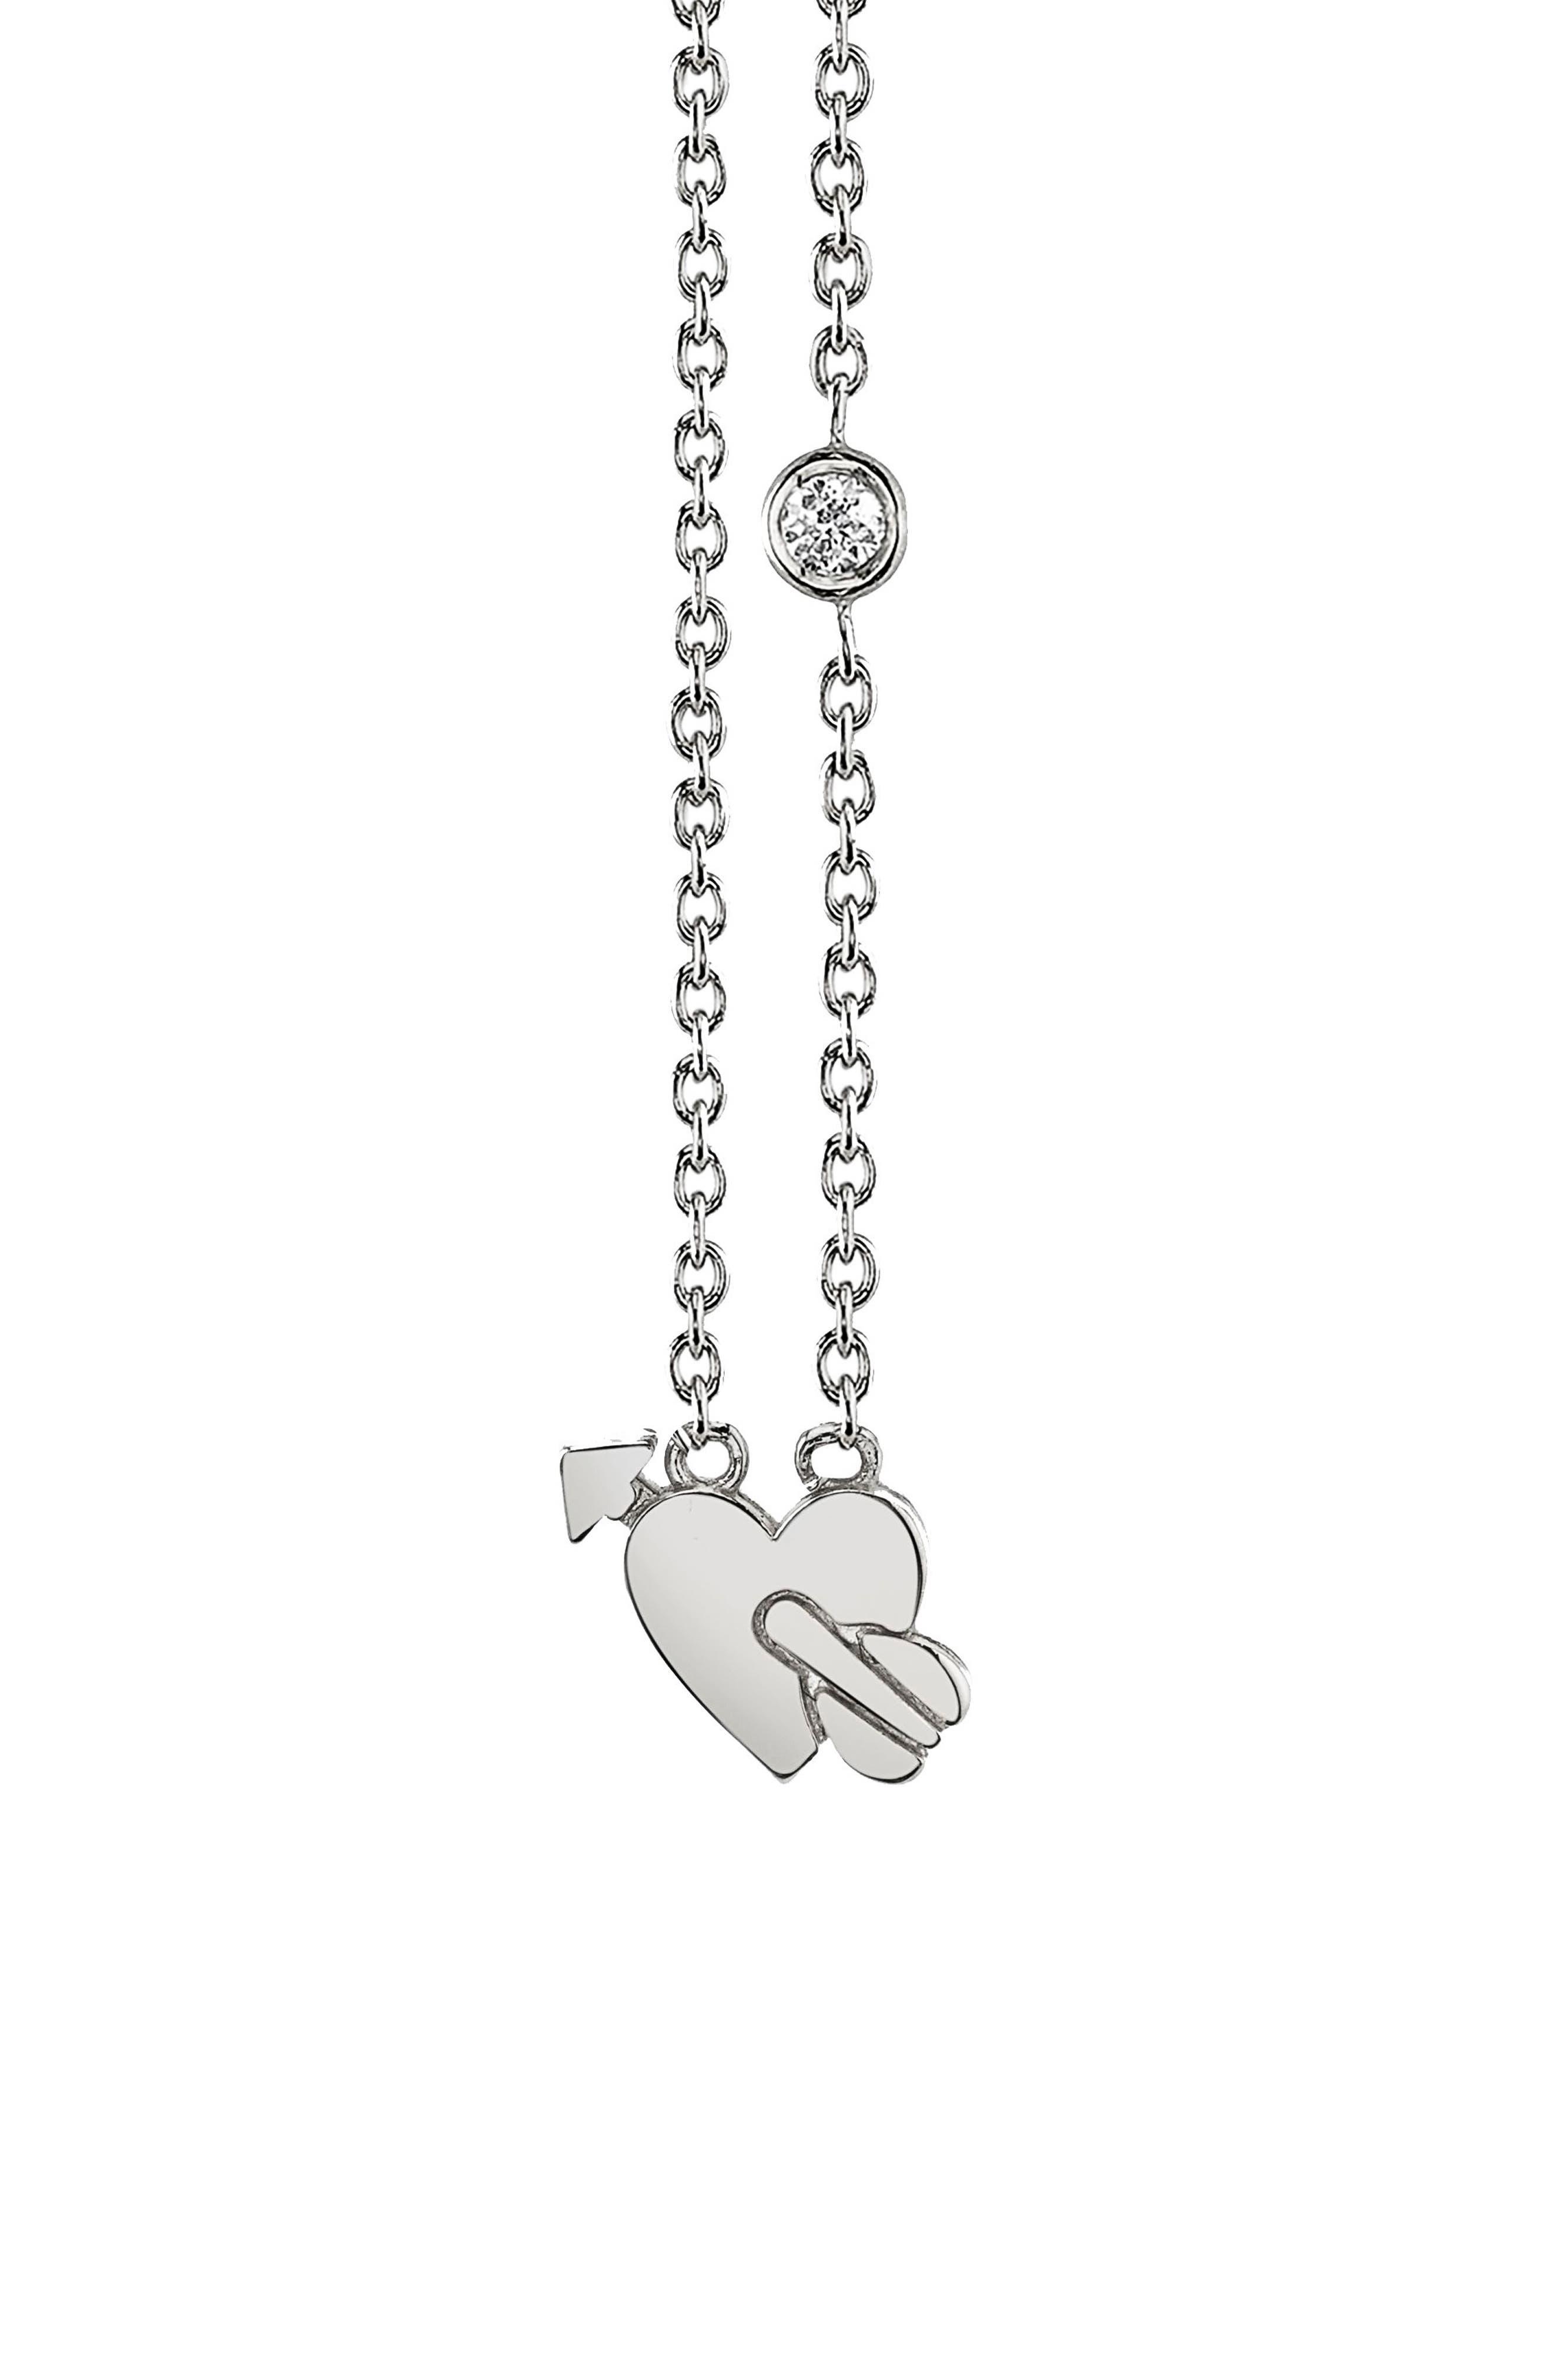 Shy be SE Lovestruck Diamond Emoji Necklace,                             Main thumbnail 1, color,                             SILVER